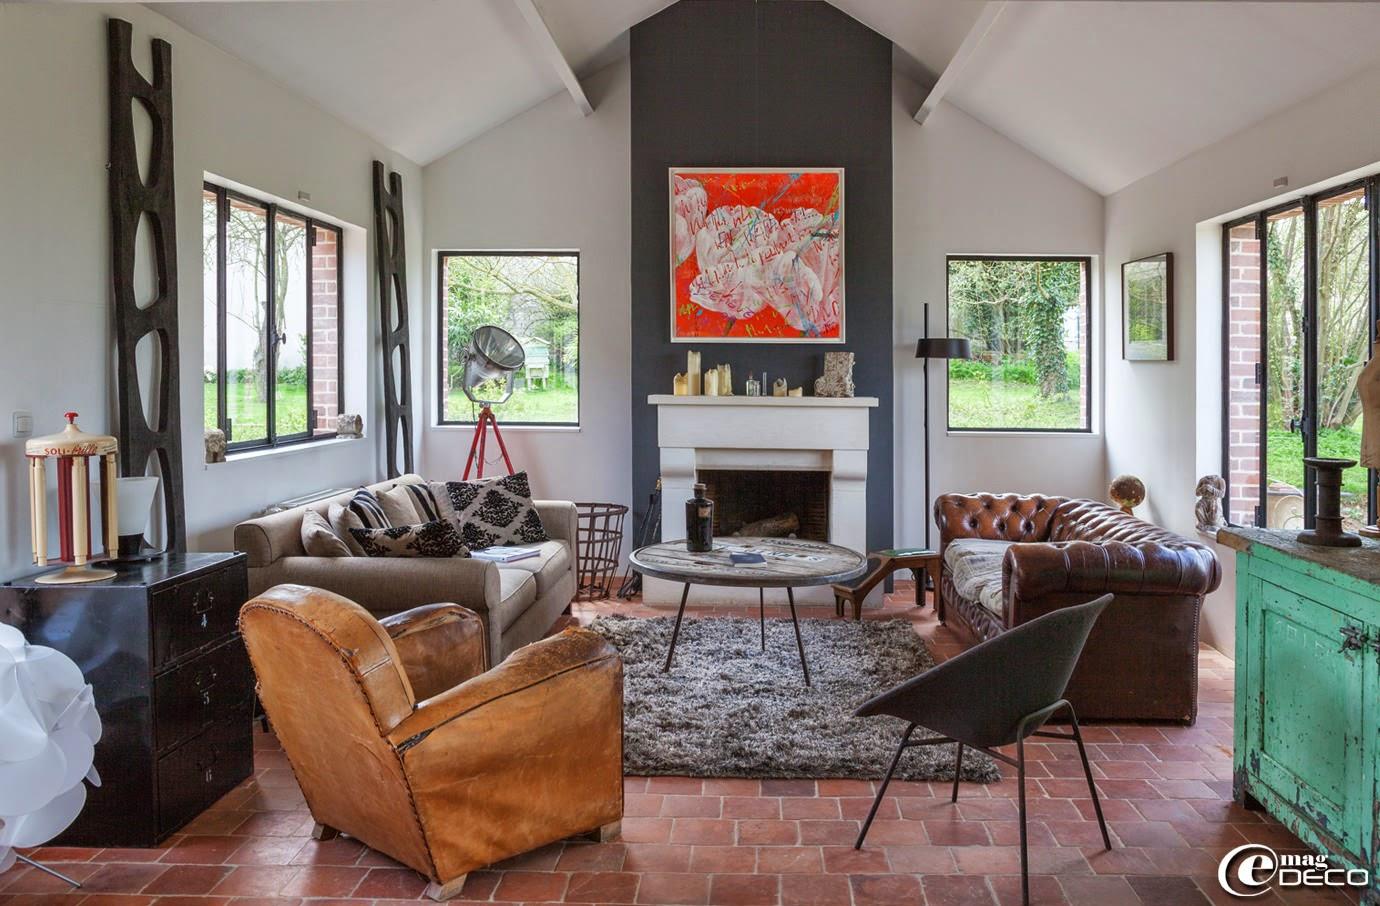 brocante de la bruy re e magdeco magazine de. Black Bedroom Furniture Sets. Home Design Ideas